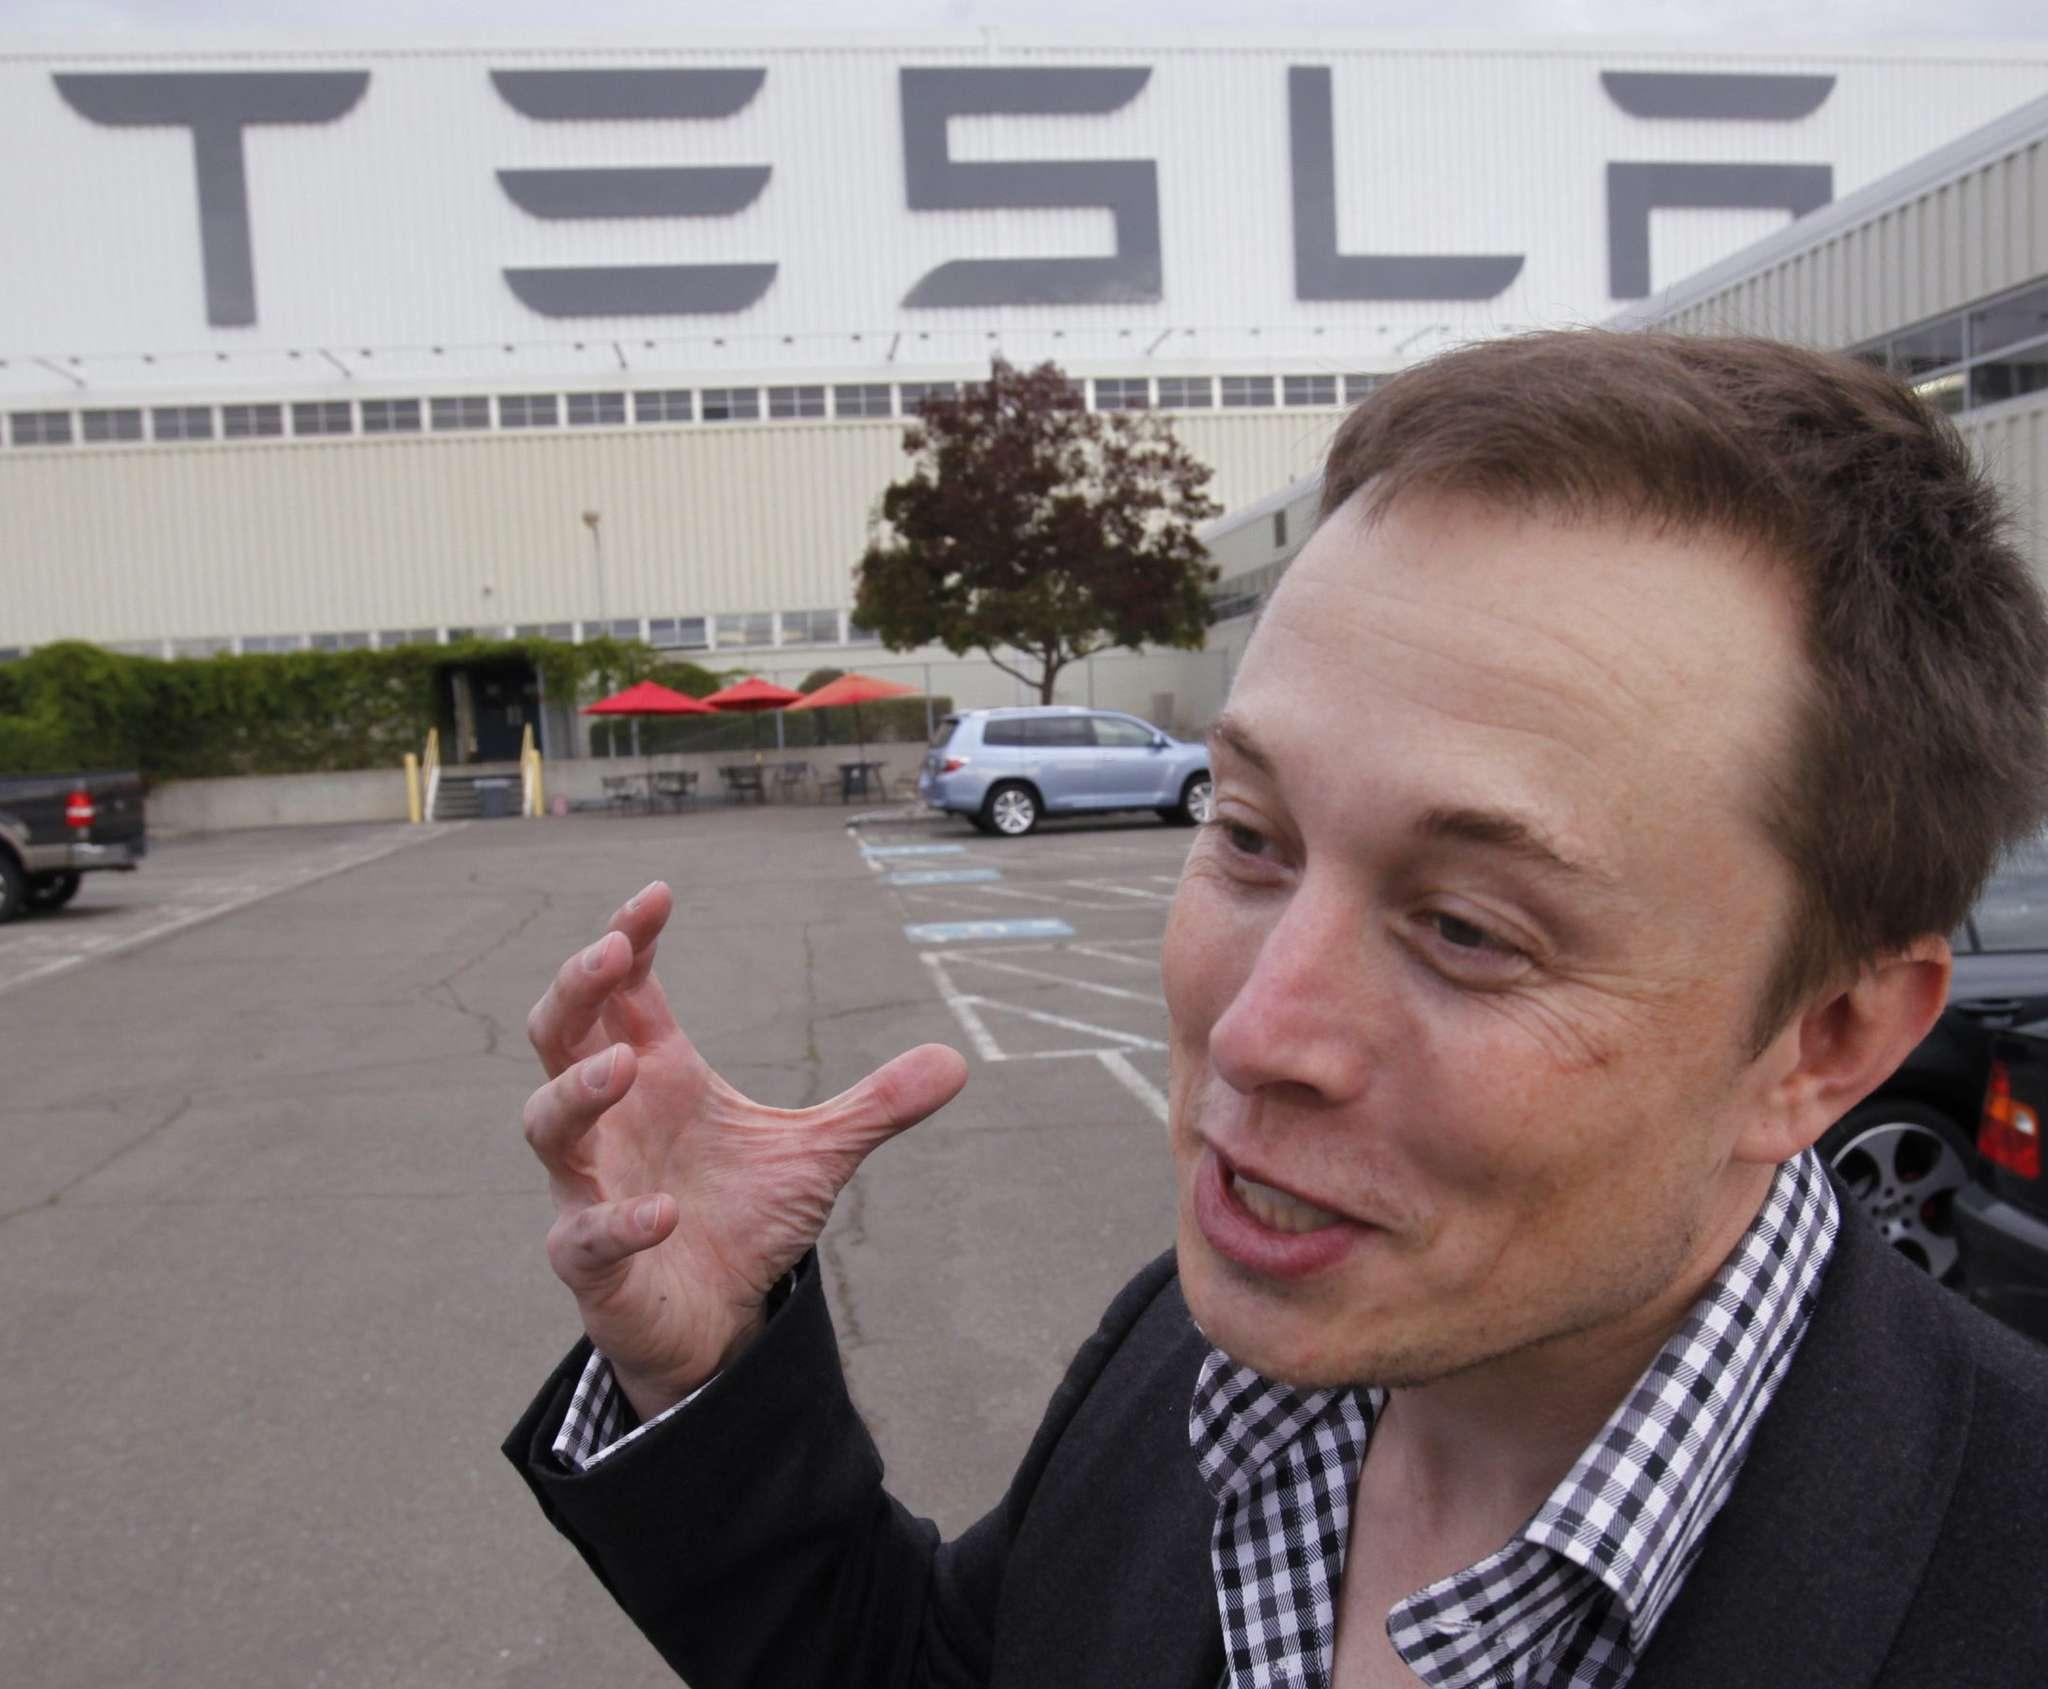 Among Penn´s billionaire graduates are casino mogul Steve Wynn, left, and Tesla Motors CEO Elon Musk.